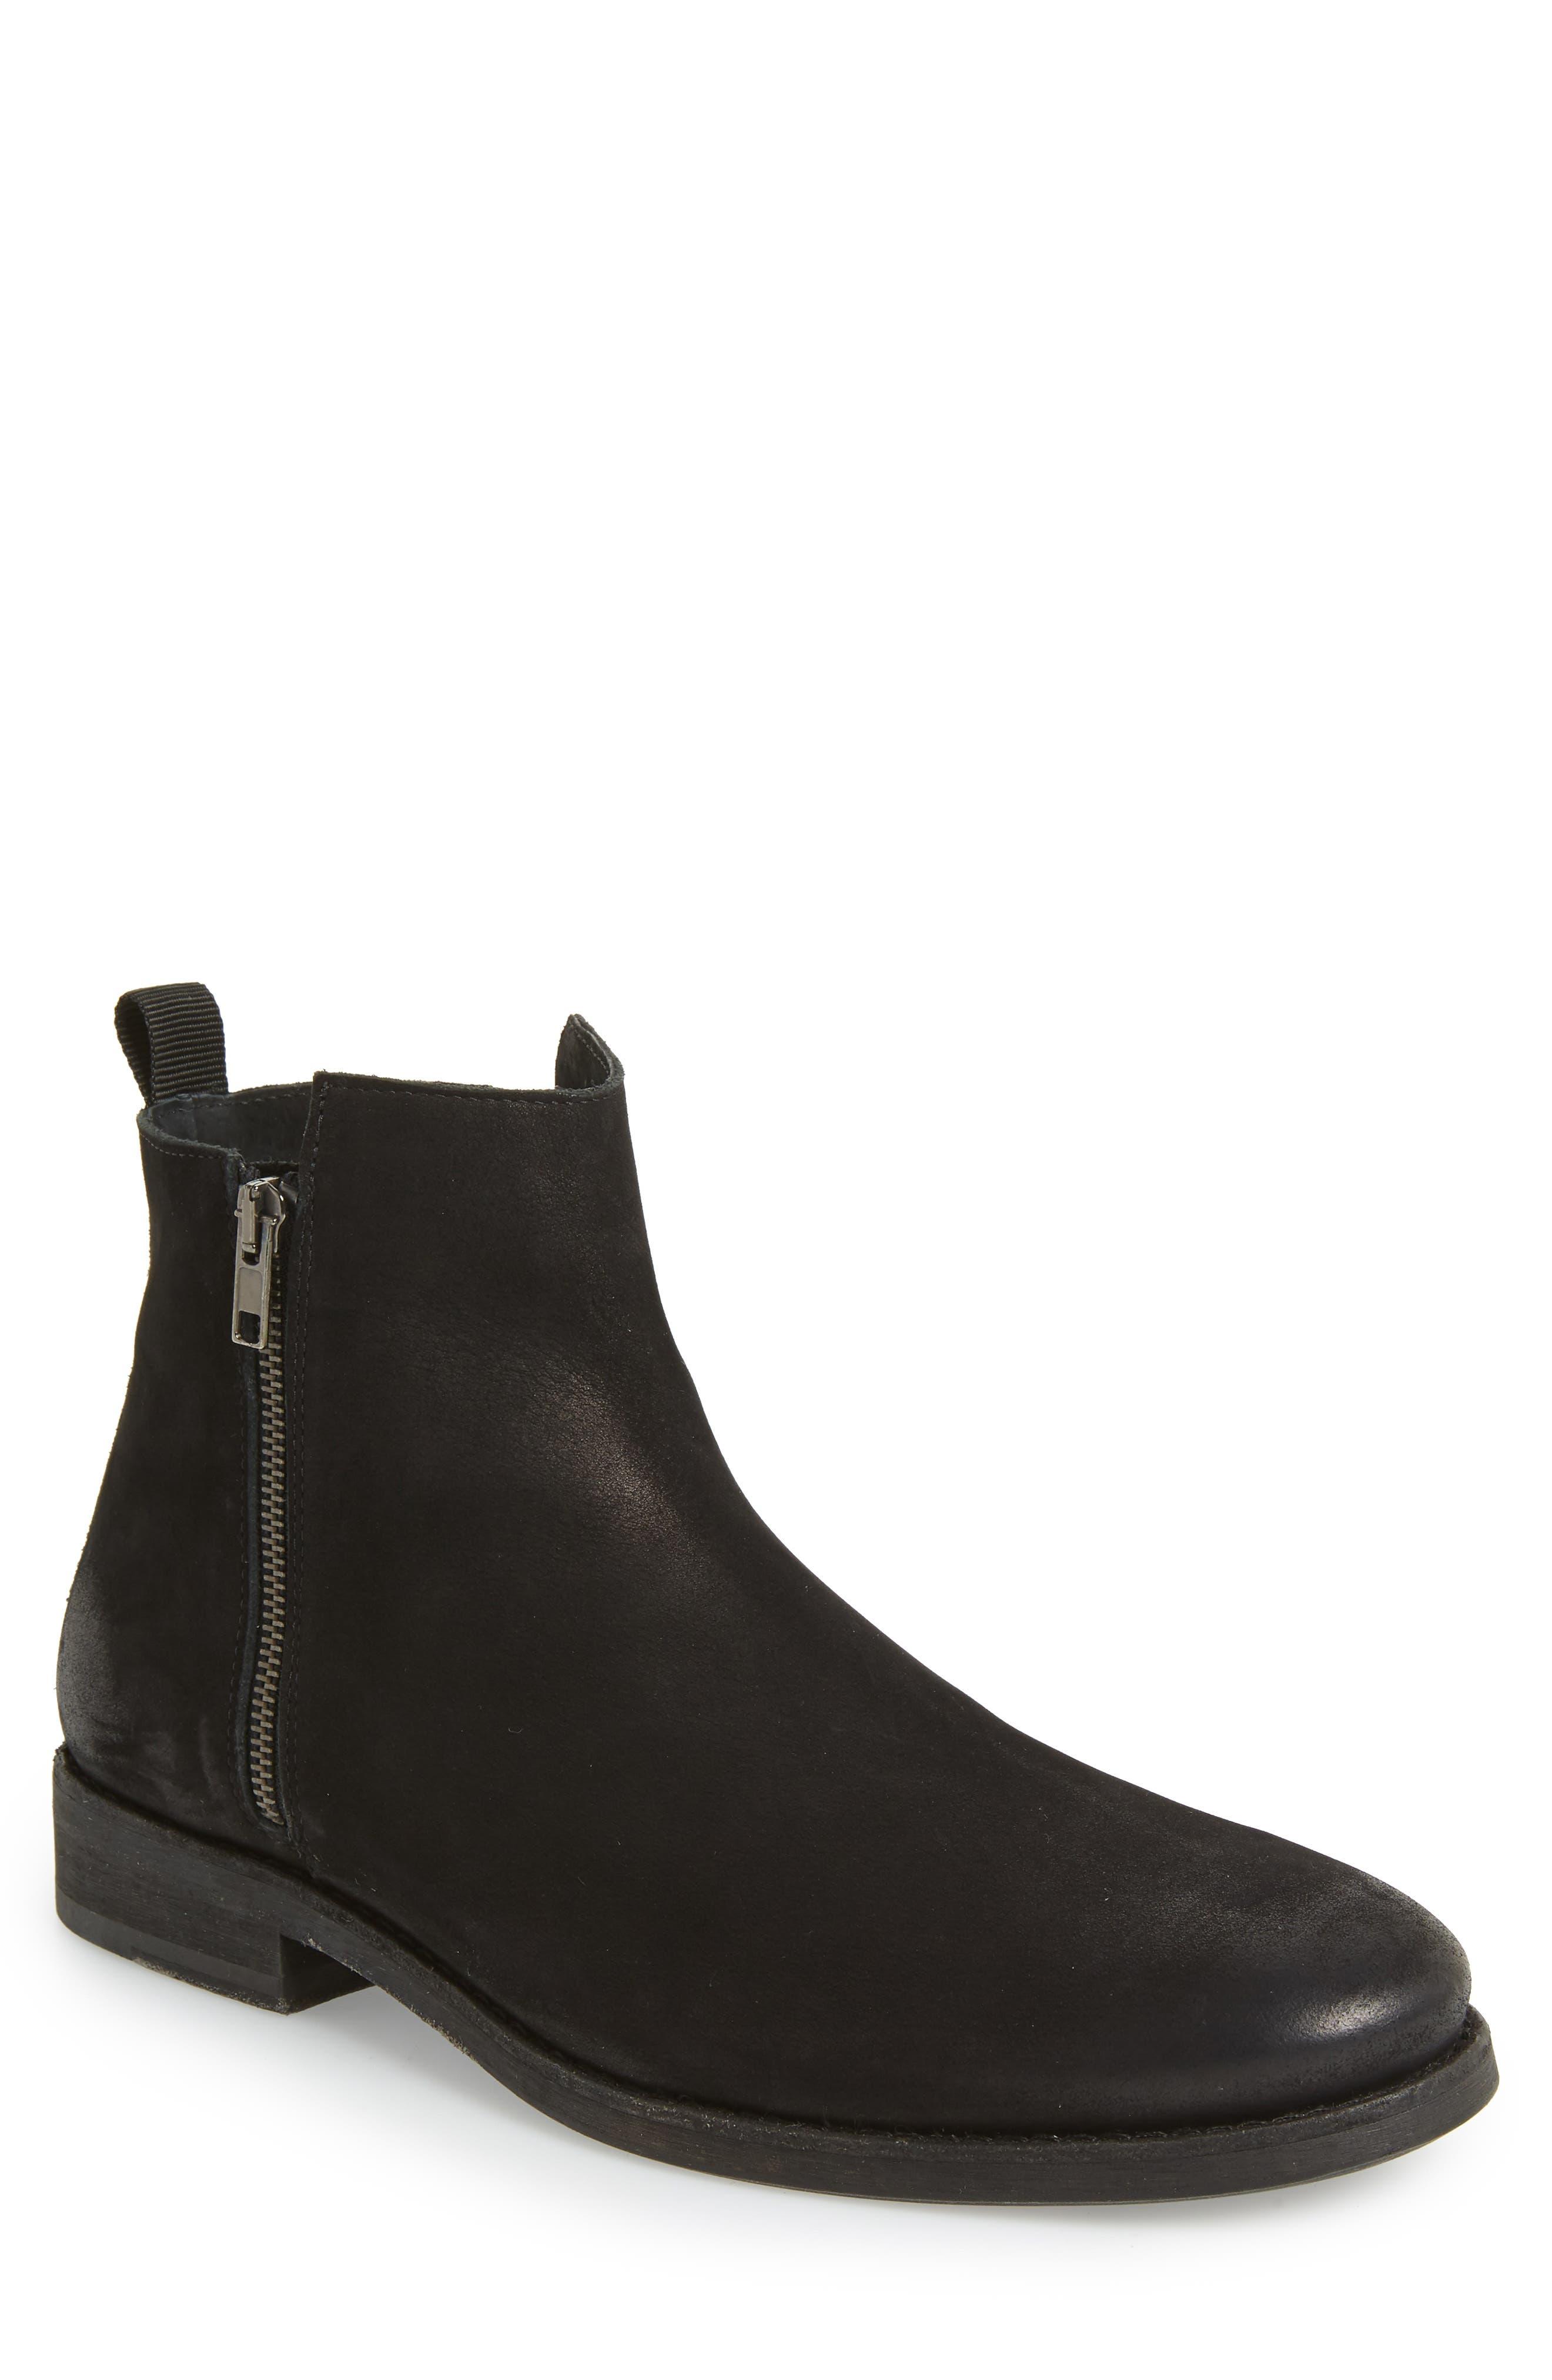 Vance Double Zipper Boot,                         Main,                         color, BLACK LEATHER